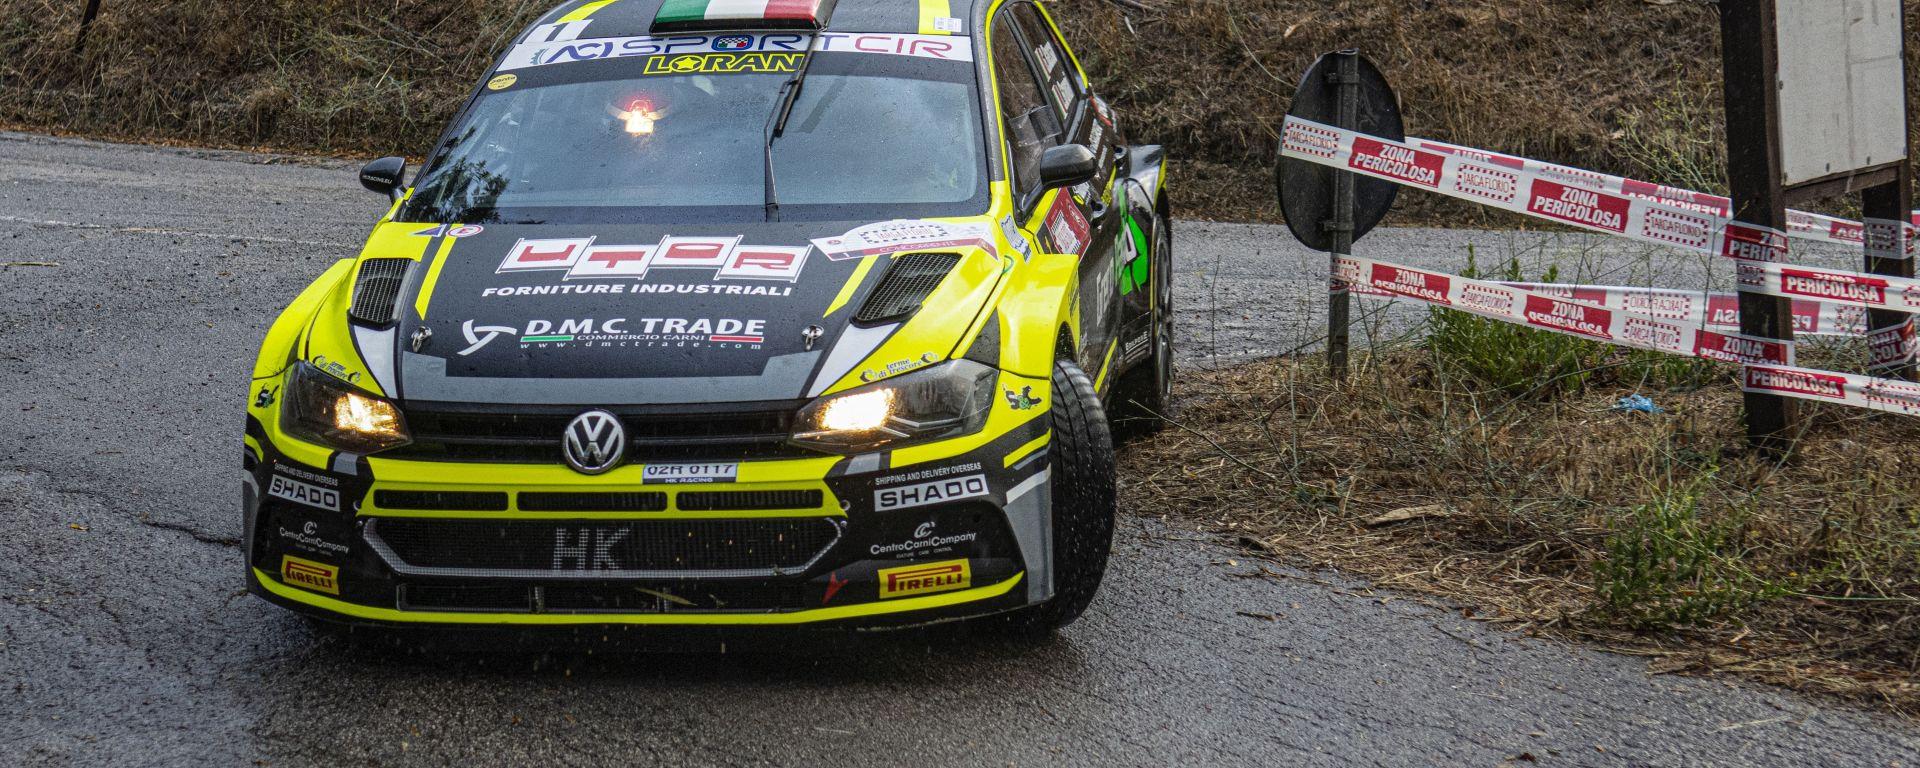 CIR, Targa Florio 2020: Giandomenico Basso (Volkswagen Polo R5) leader dopo il round 4